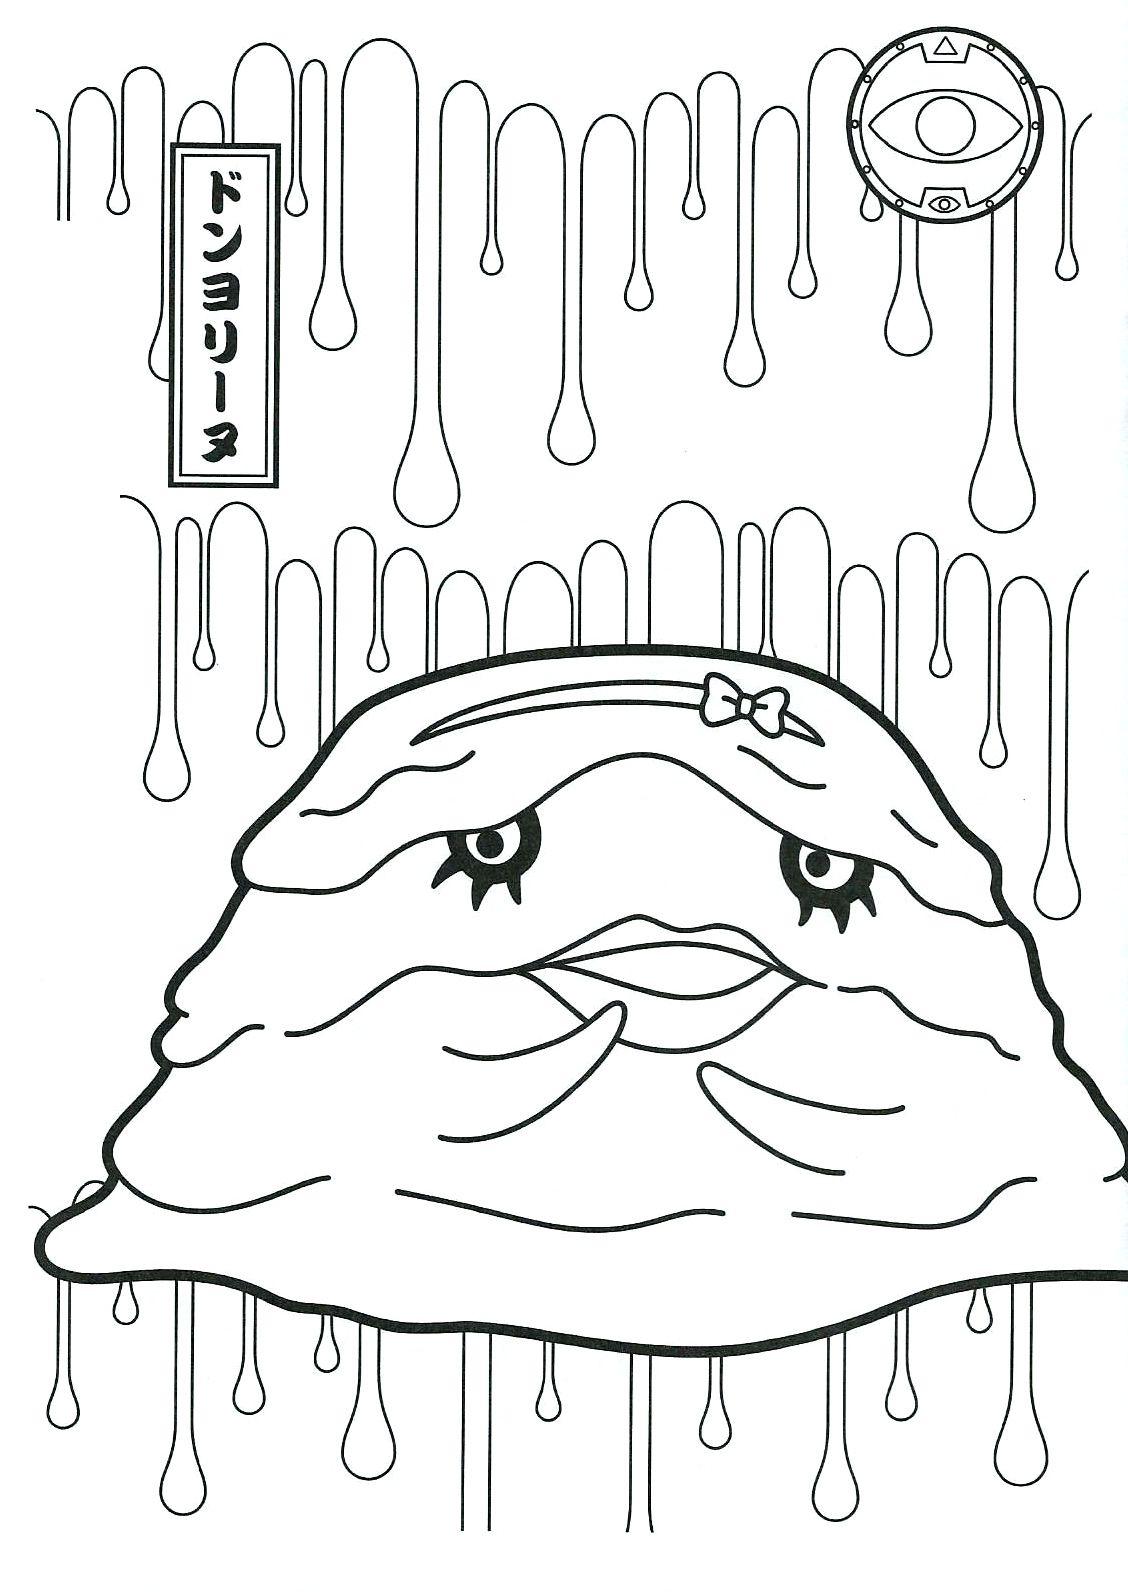 Coloring pages yokai - Youkai Robonyan Yokai Watch Pinterest Nintendo Pok Mon And Manga